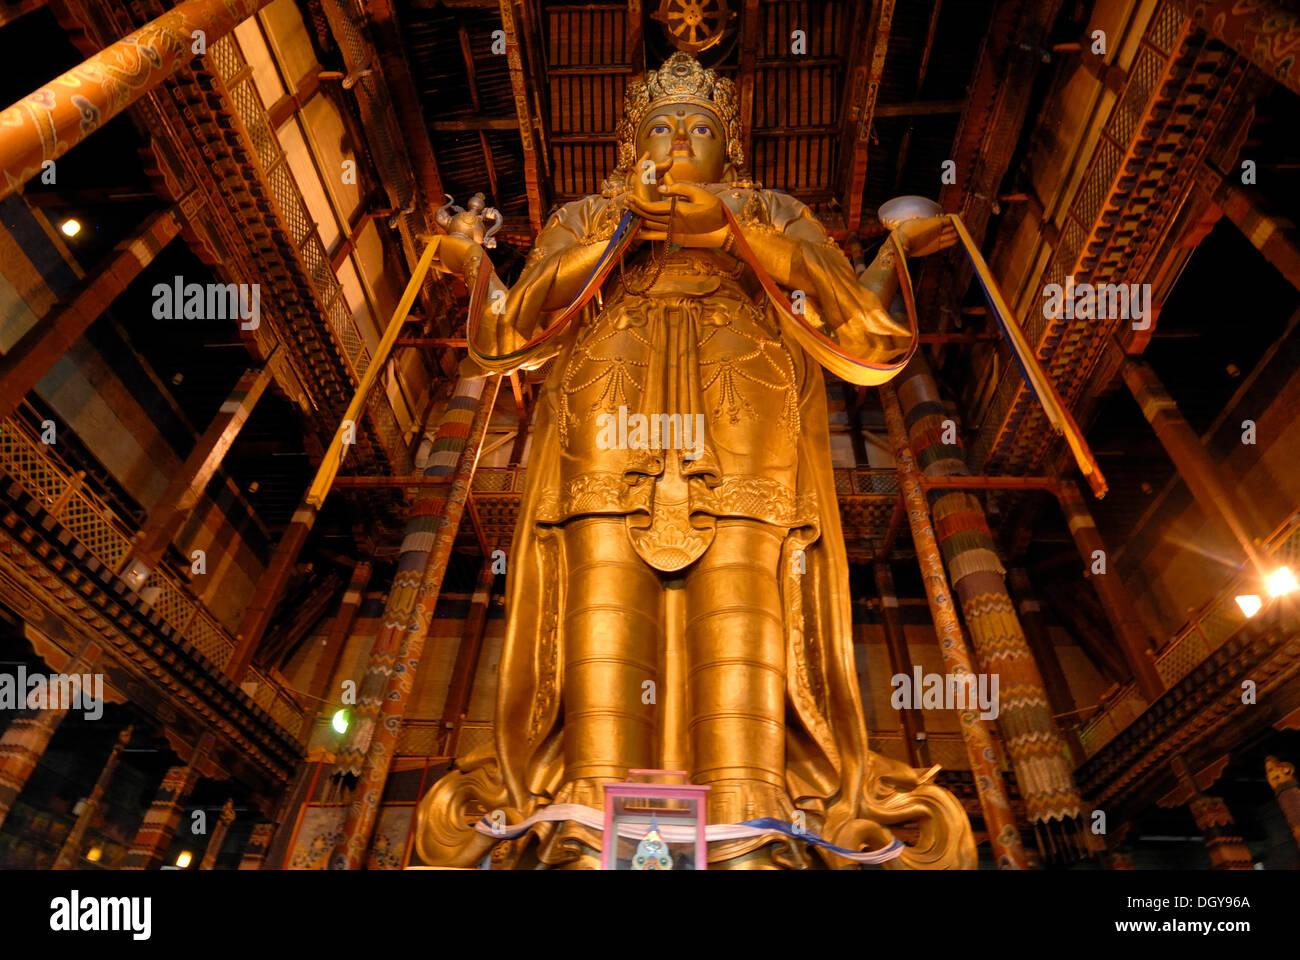 26 meter high statue of the goddess Janraisig or Avalokiteshvara, Gandan Monastery, Migjid Janraisig Sueme, Gandan Khiid - Stock Image